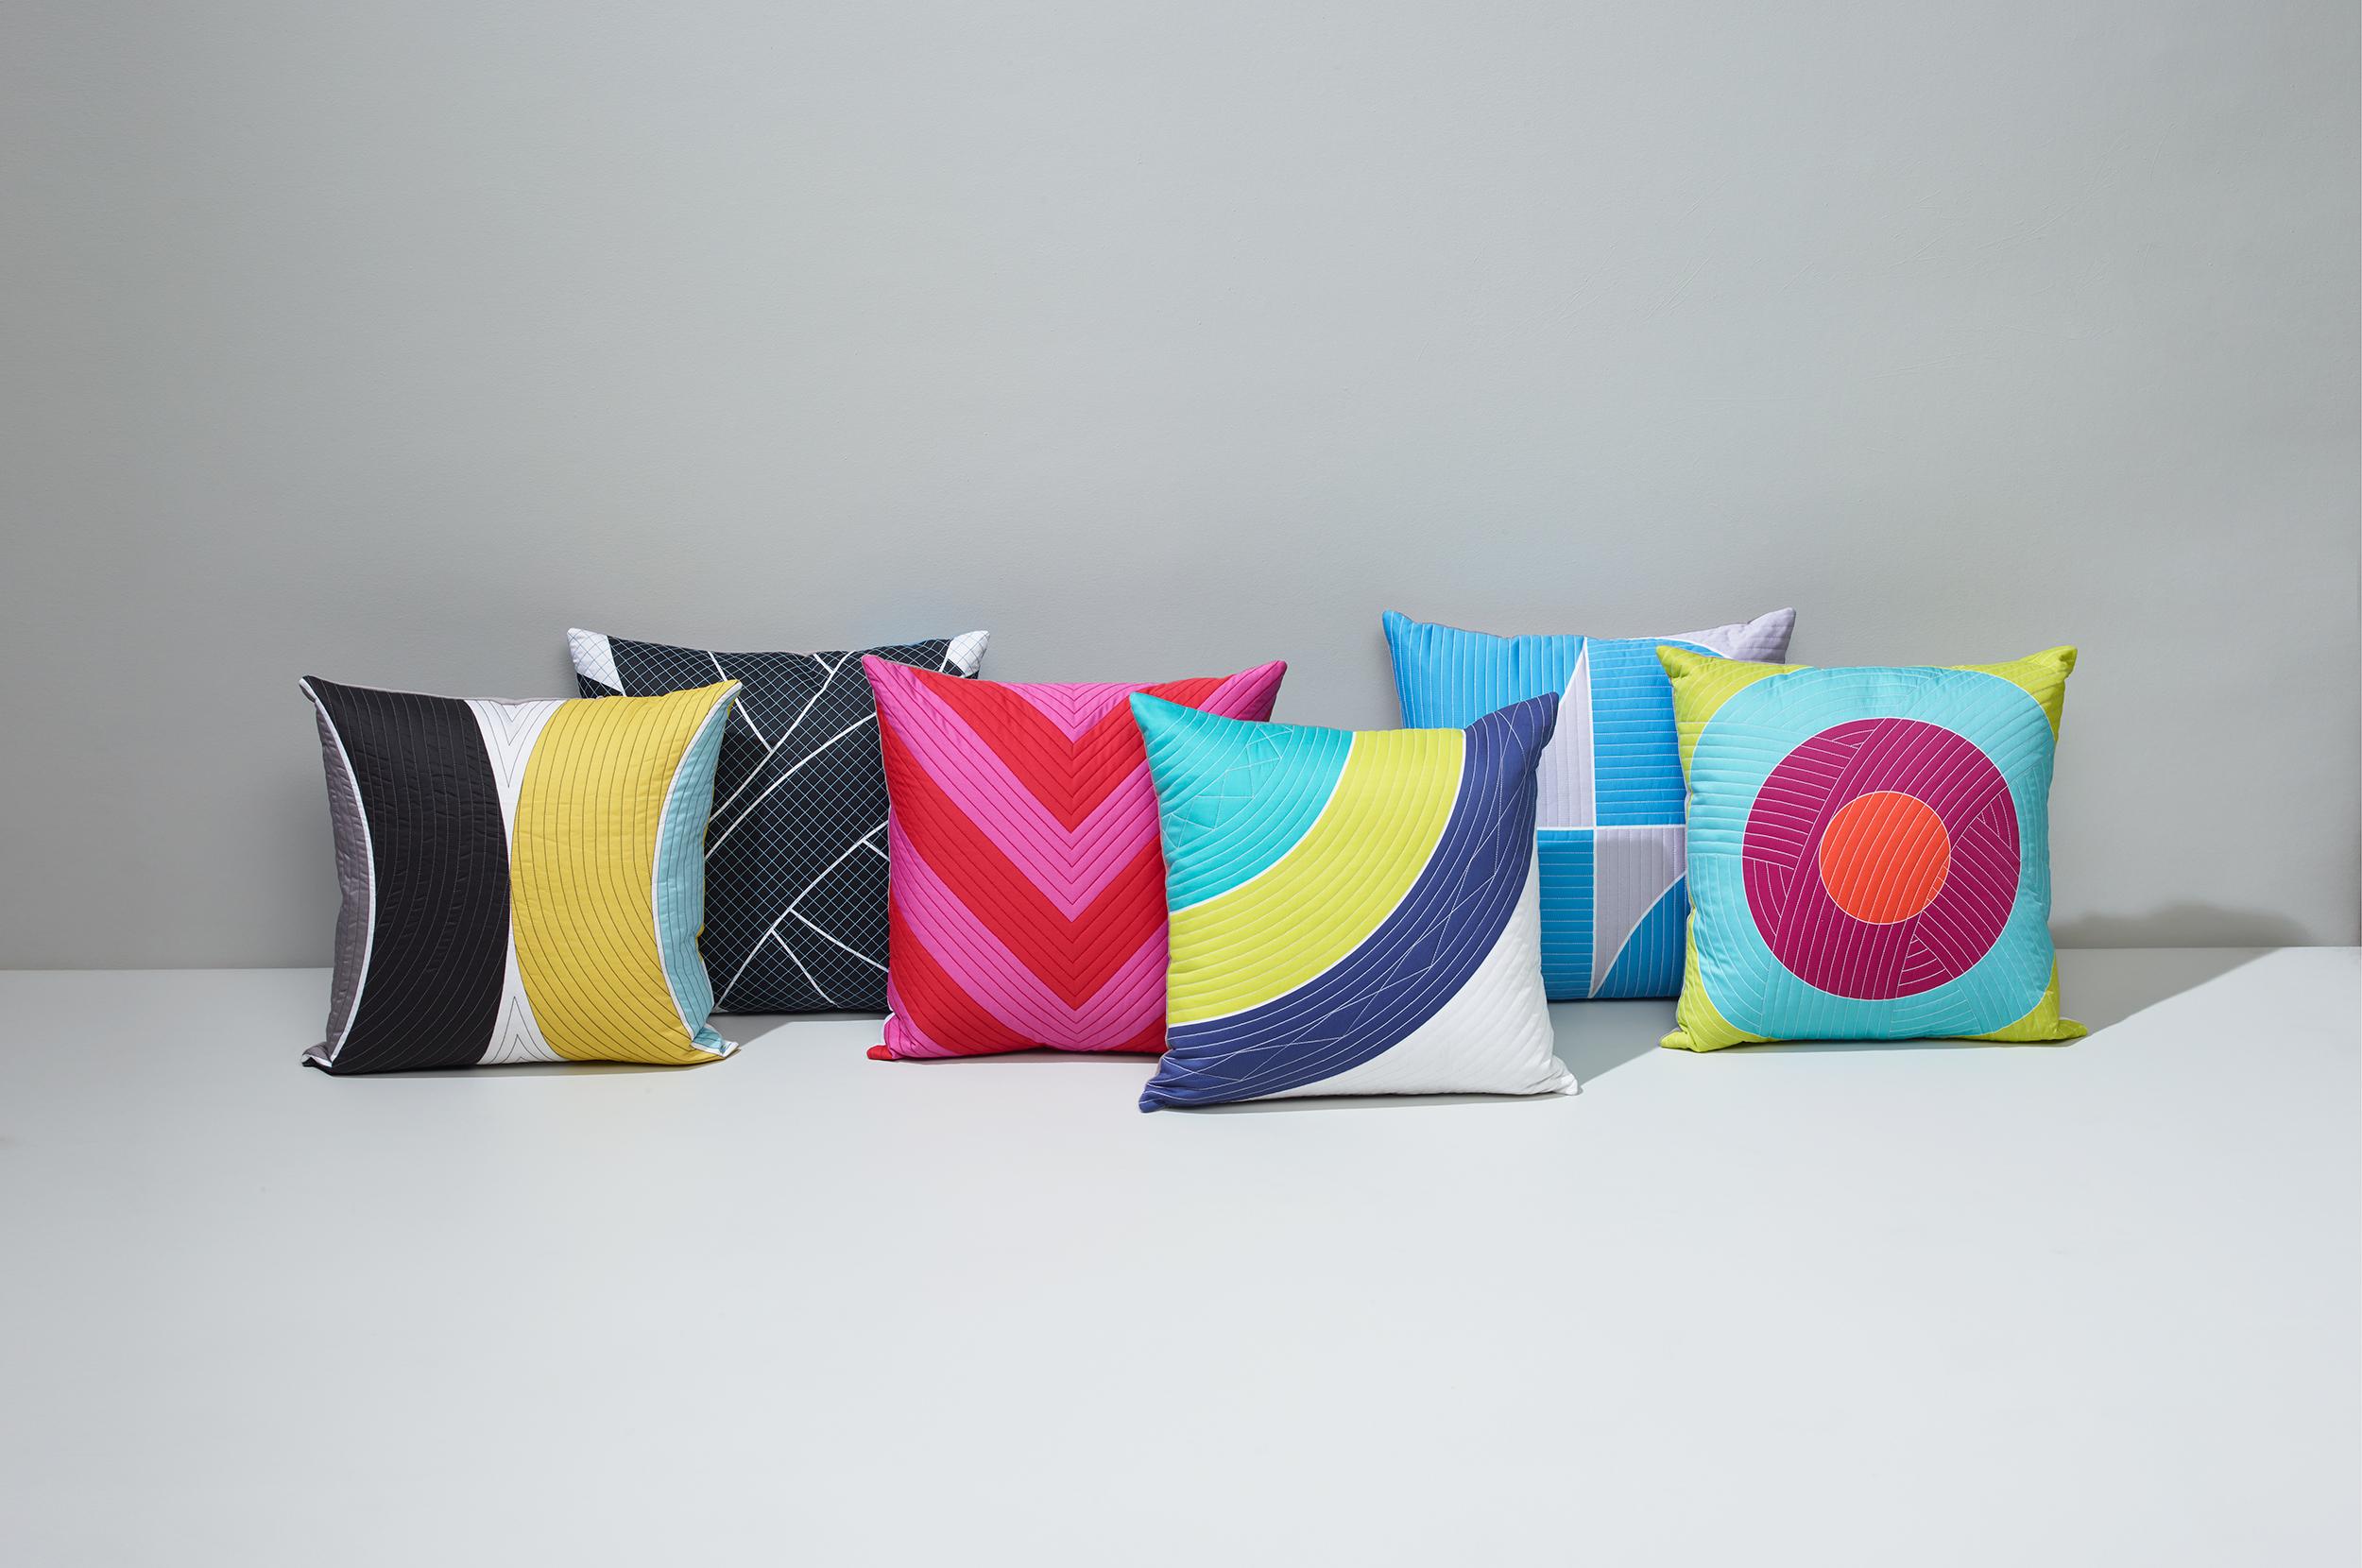 Pillows_Family_StraightOn_COMP_Oa.jpg